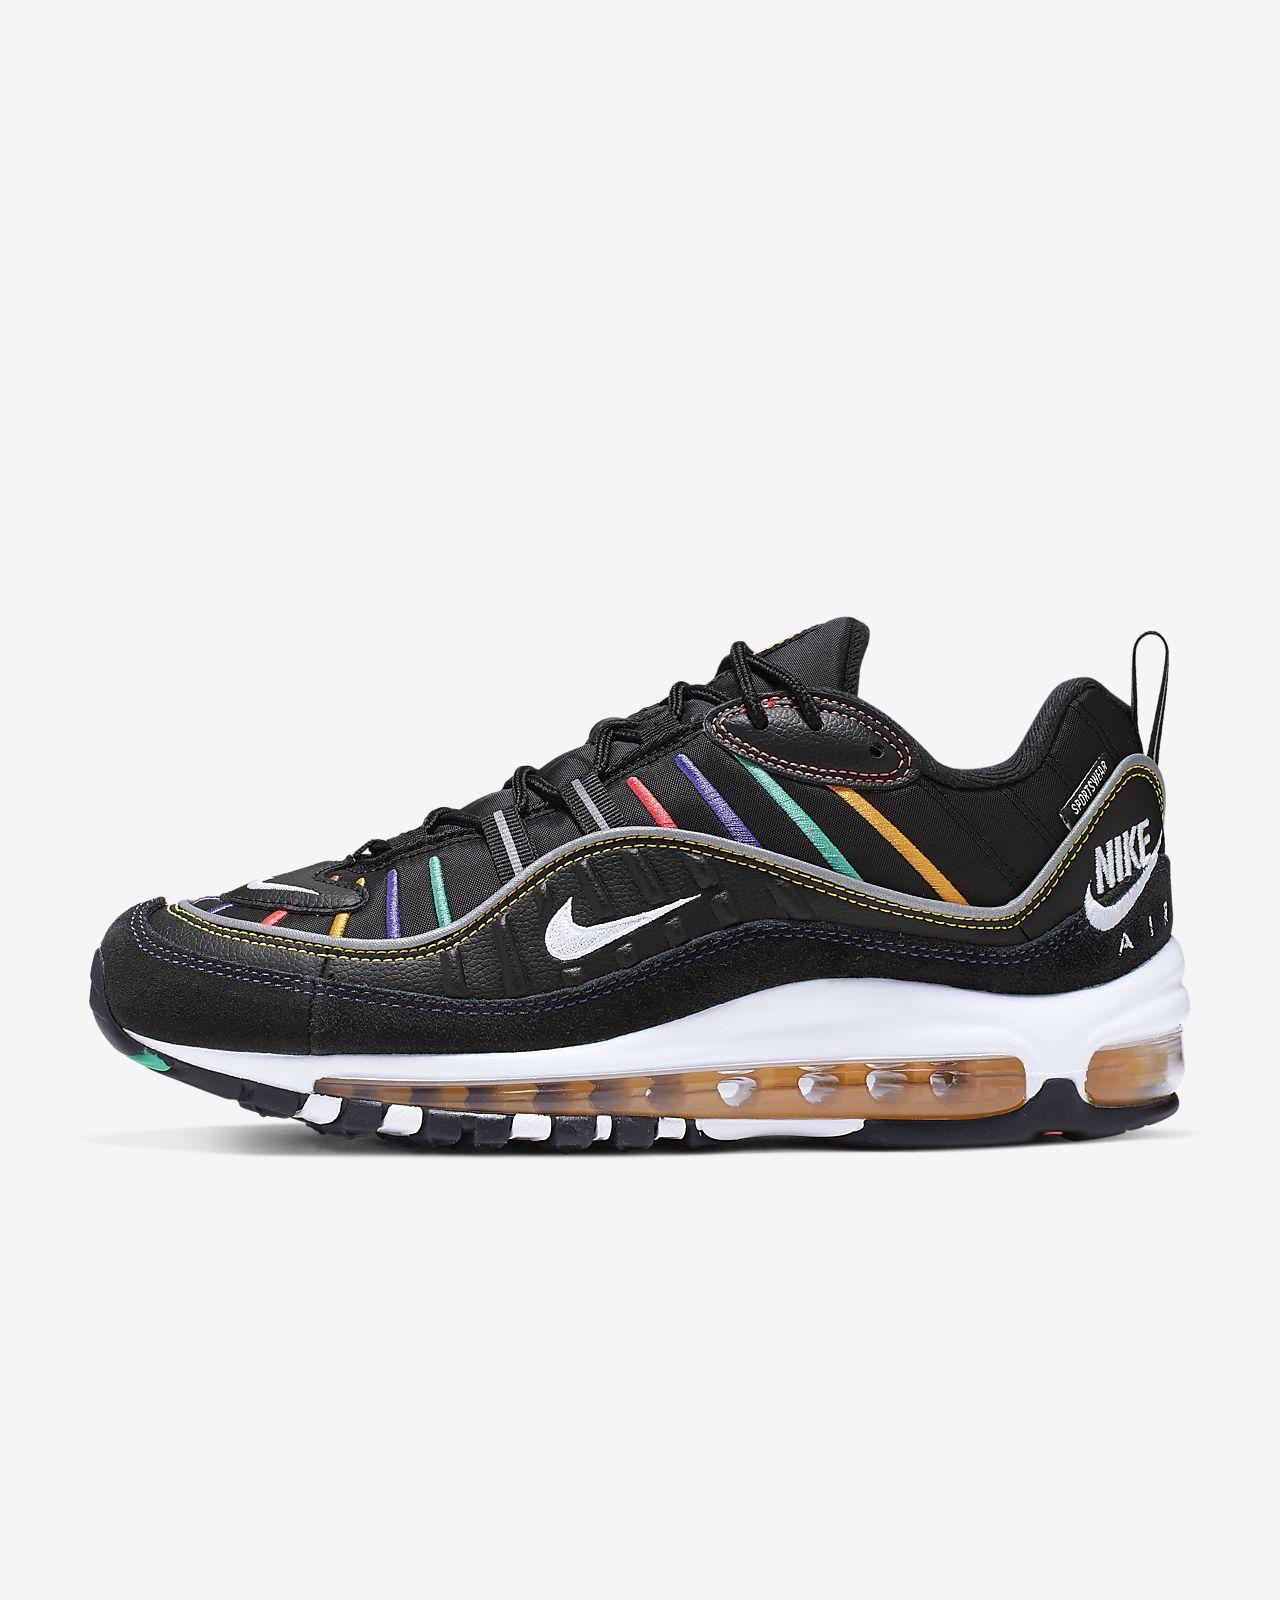 Nike Air Max 98 PRM女子运动鞋